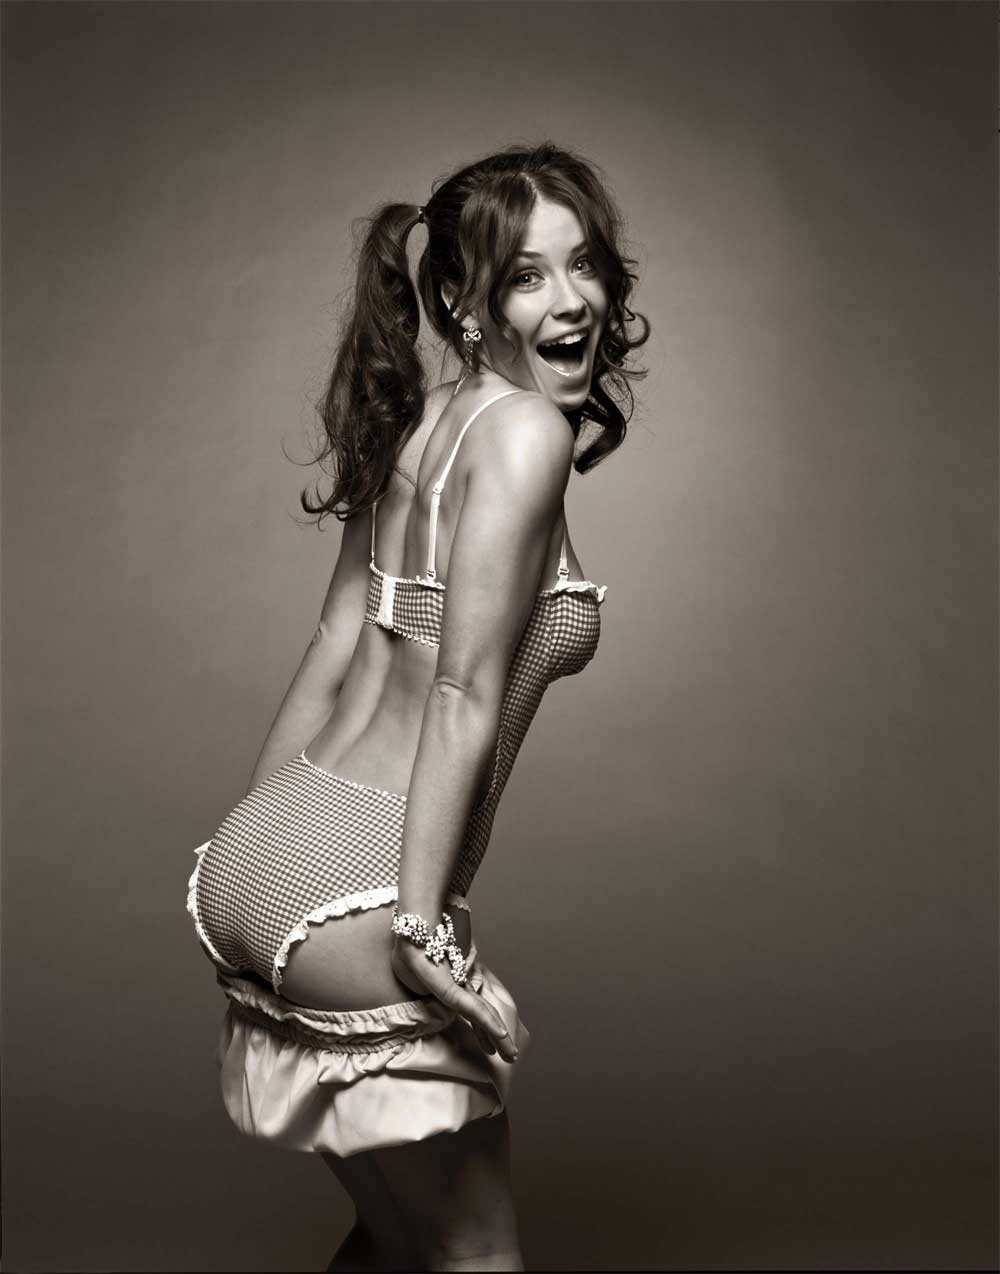 Wallpaper Cinema Video Evangeline Lilly jeune sexy